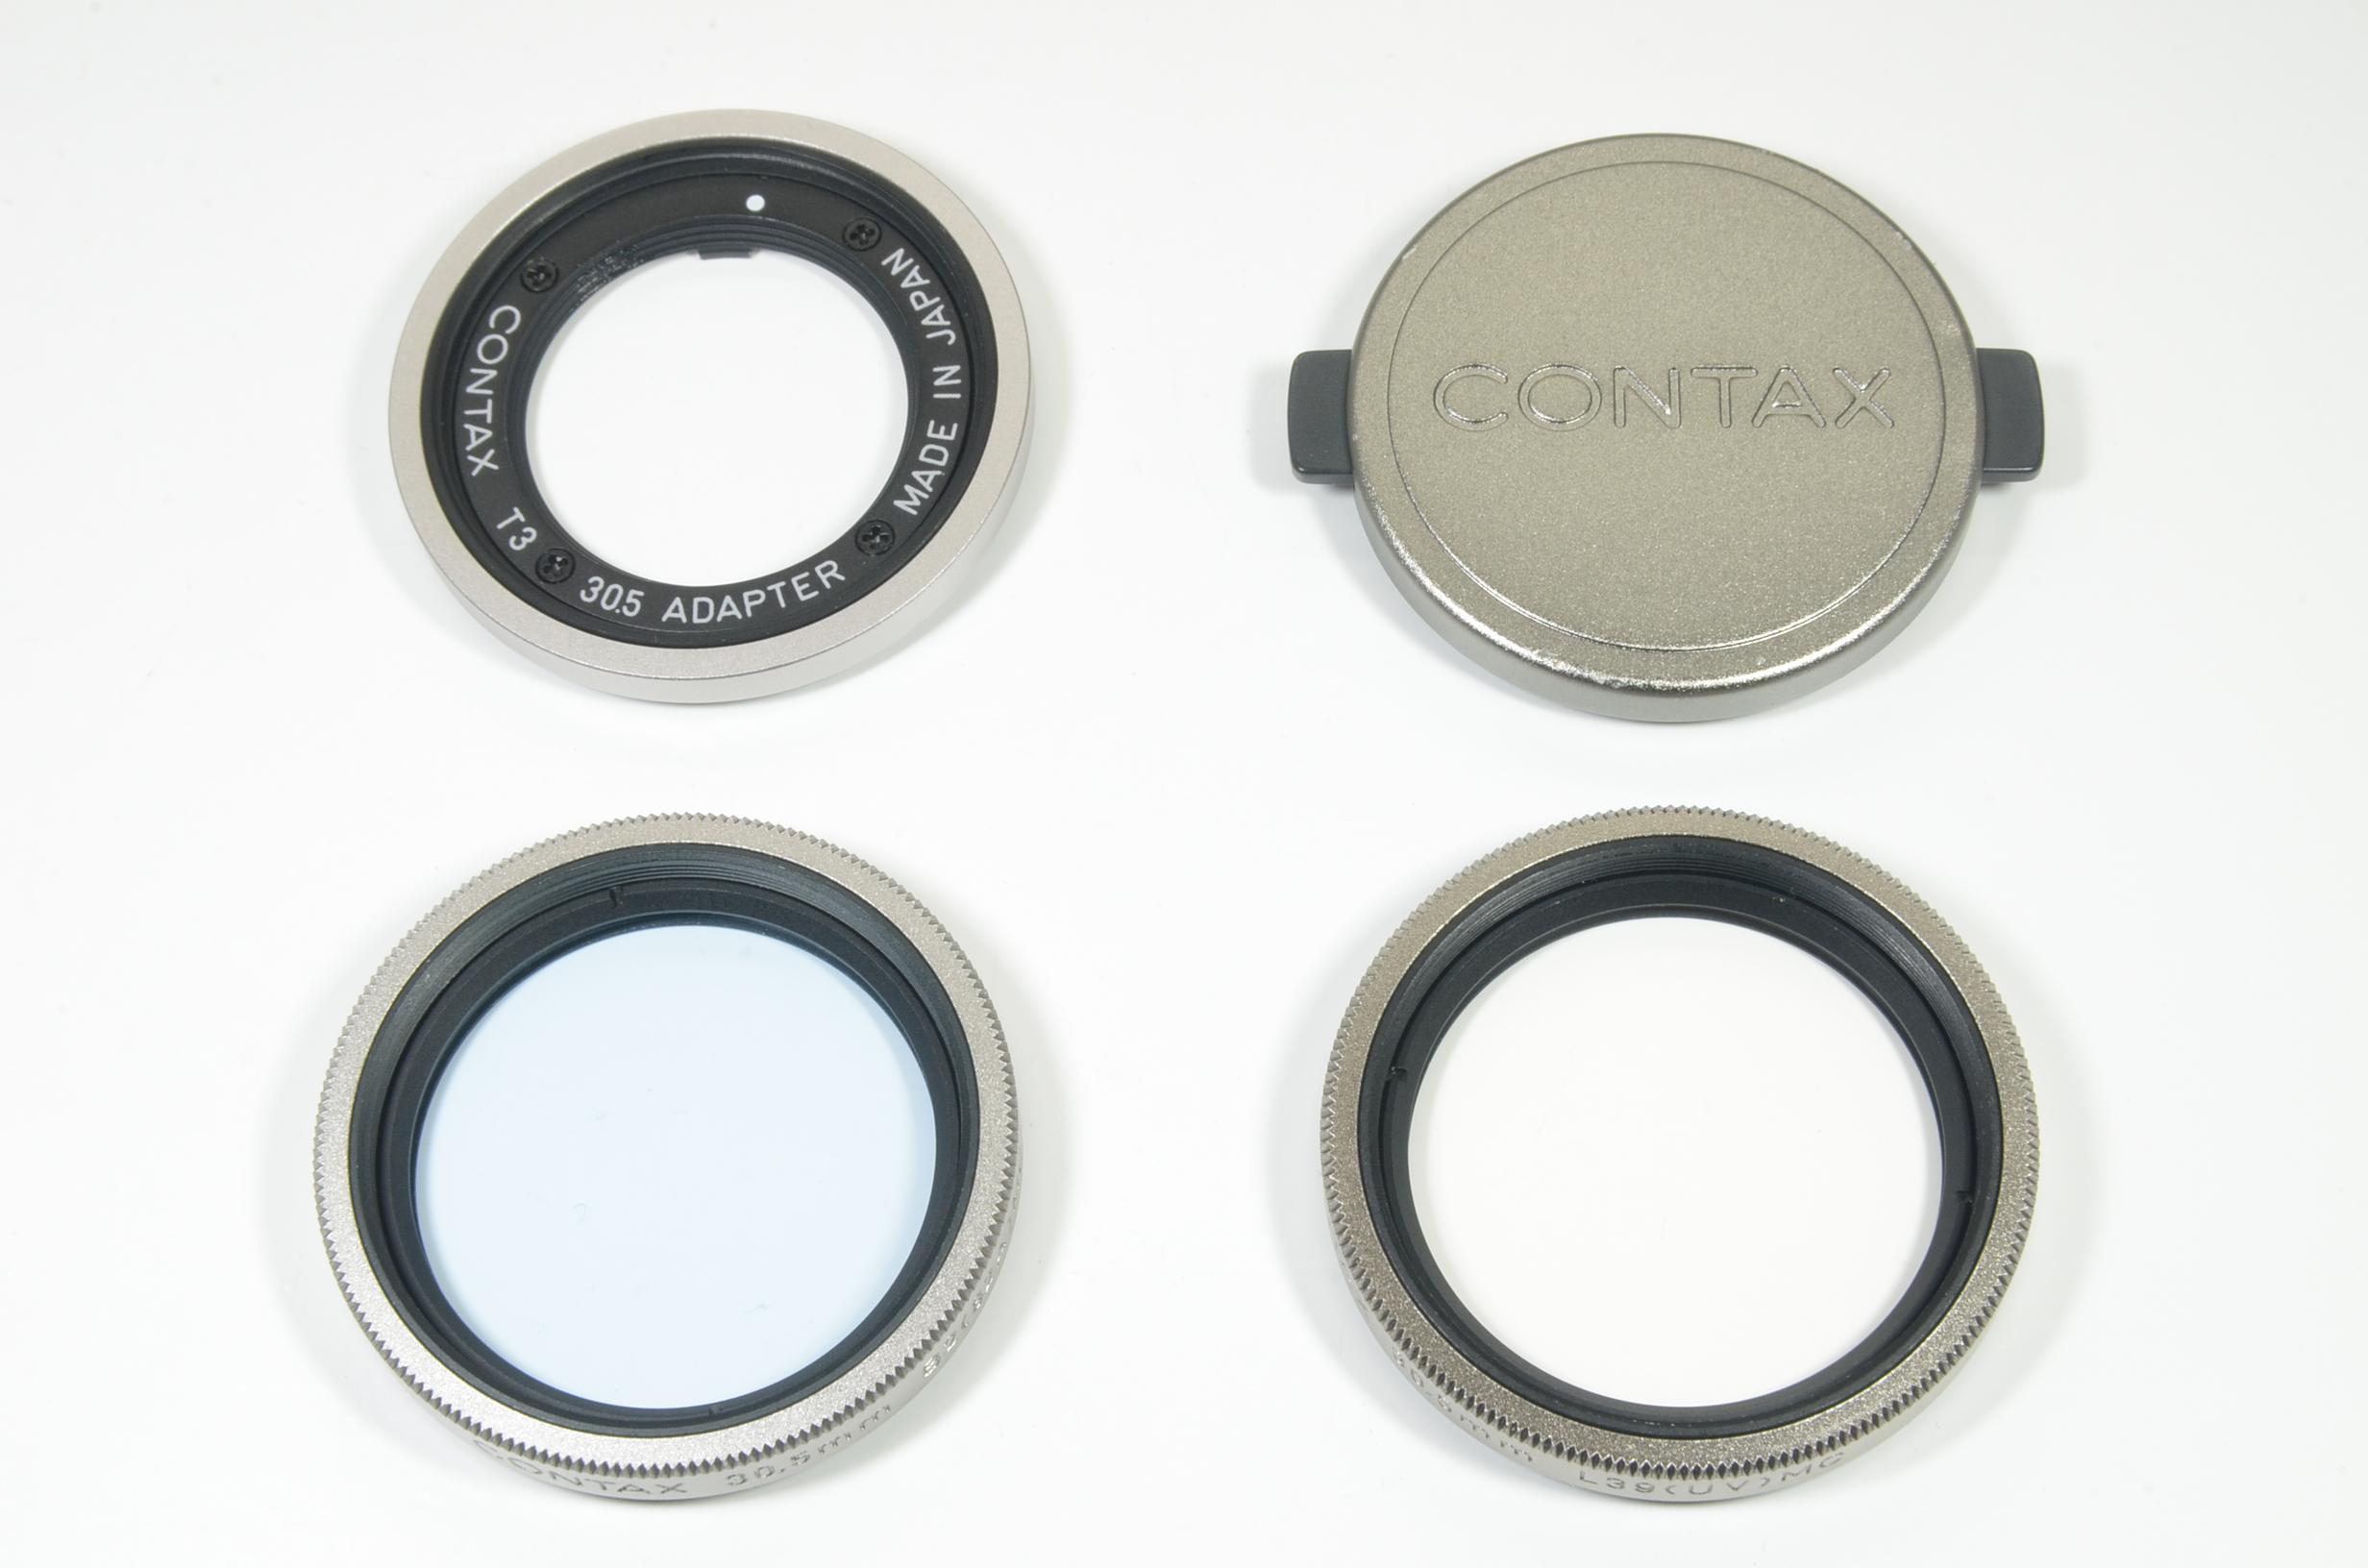 contax t3 30.5 adapter, filters b2(82a) mc, l39(uv) mc, and cap (k-31)